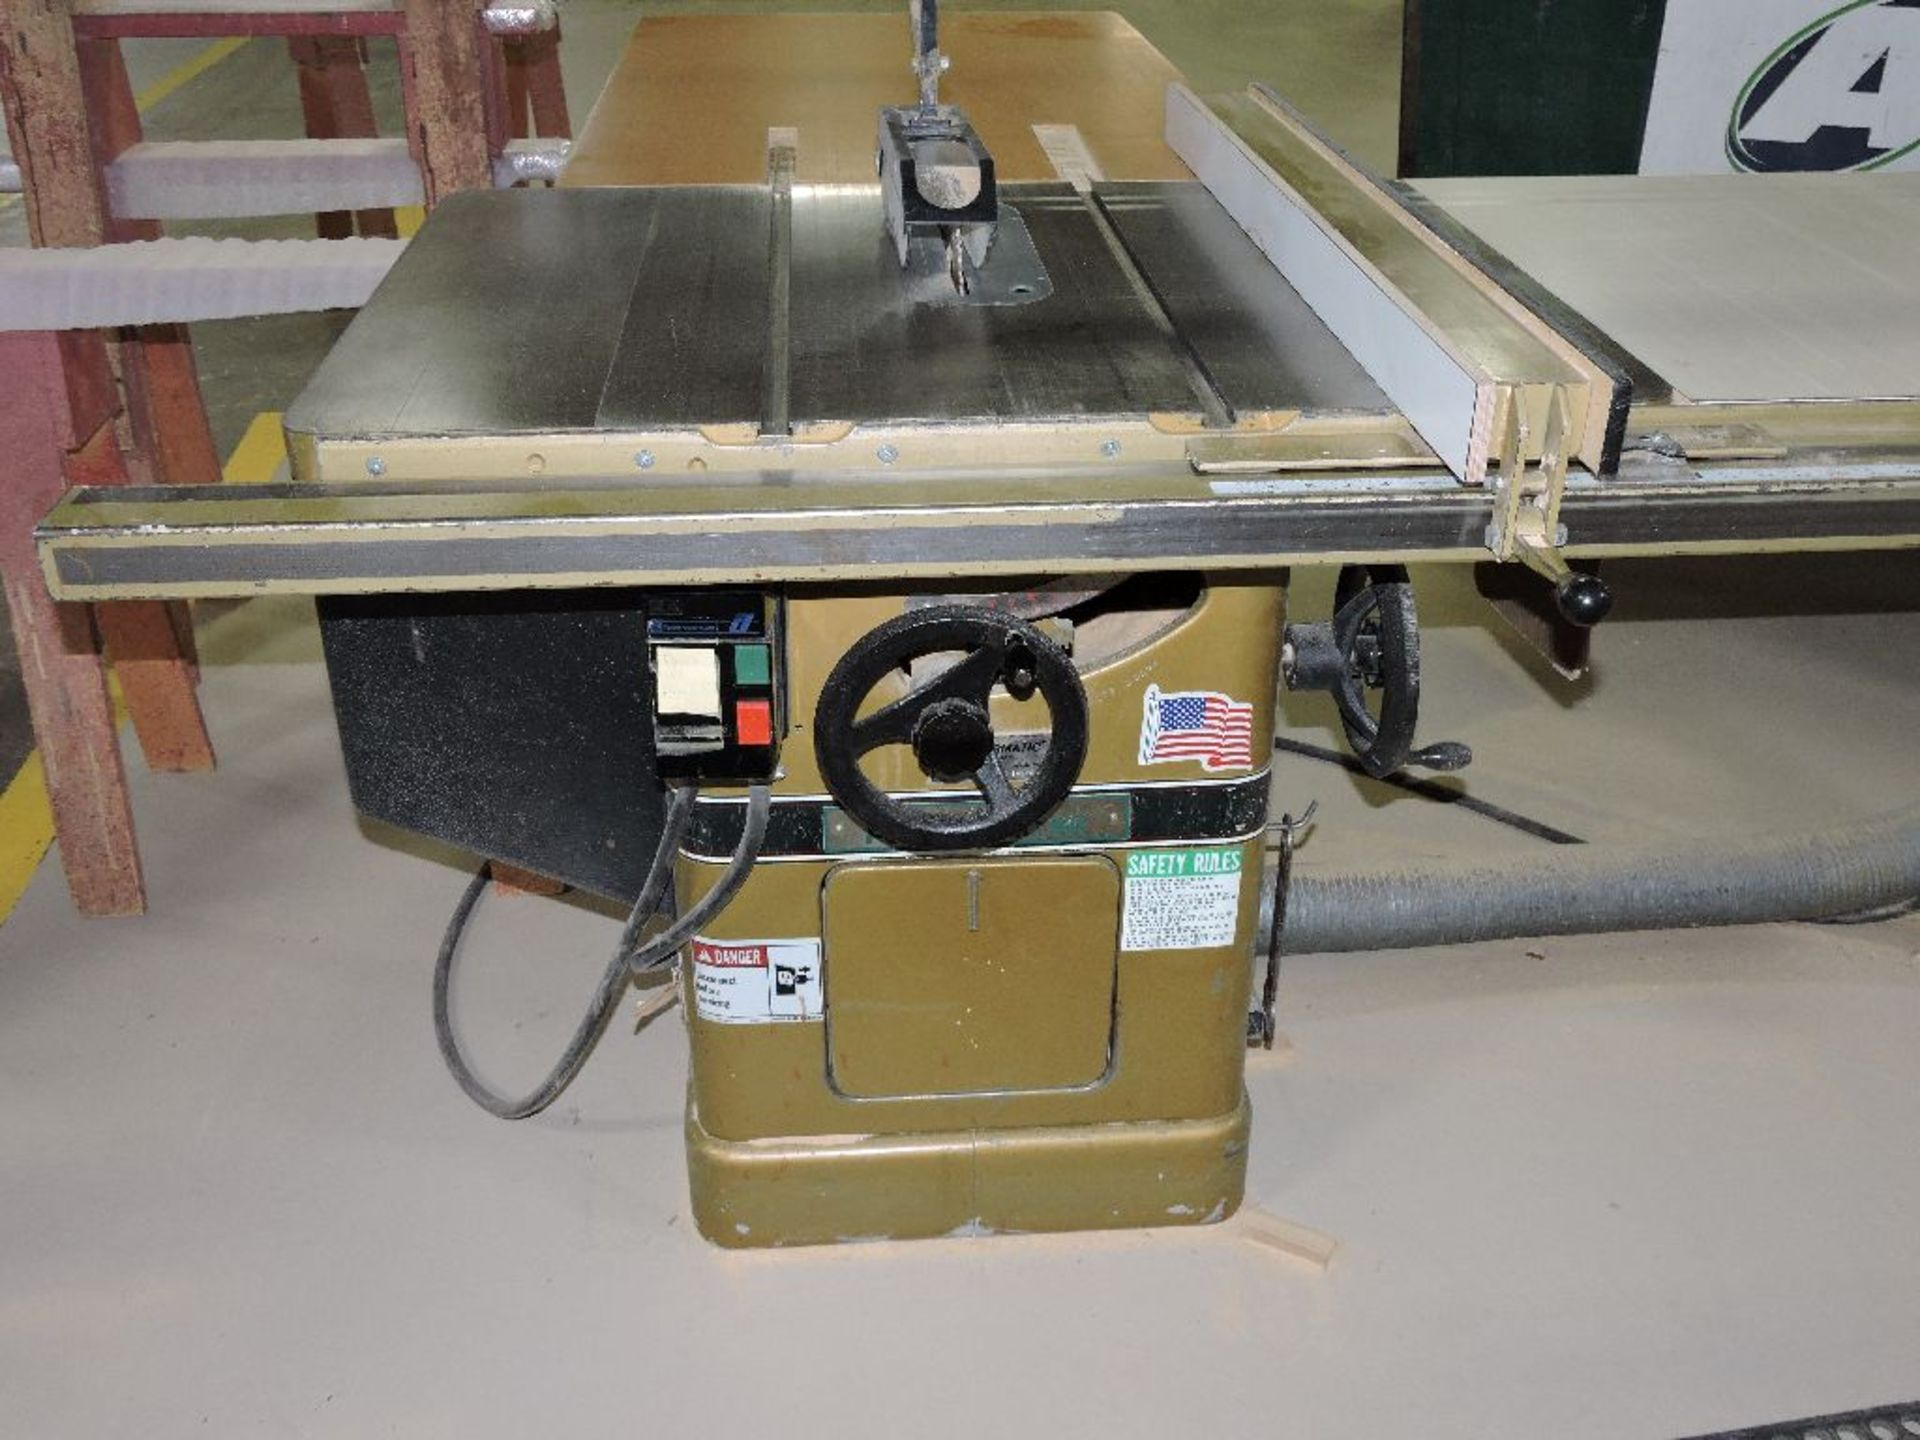 "Lot 017 - Powermatic jointer model 60, sn 940065, 6"", voltage 230/460."